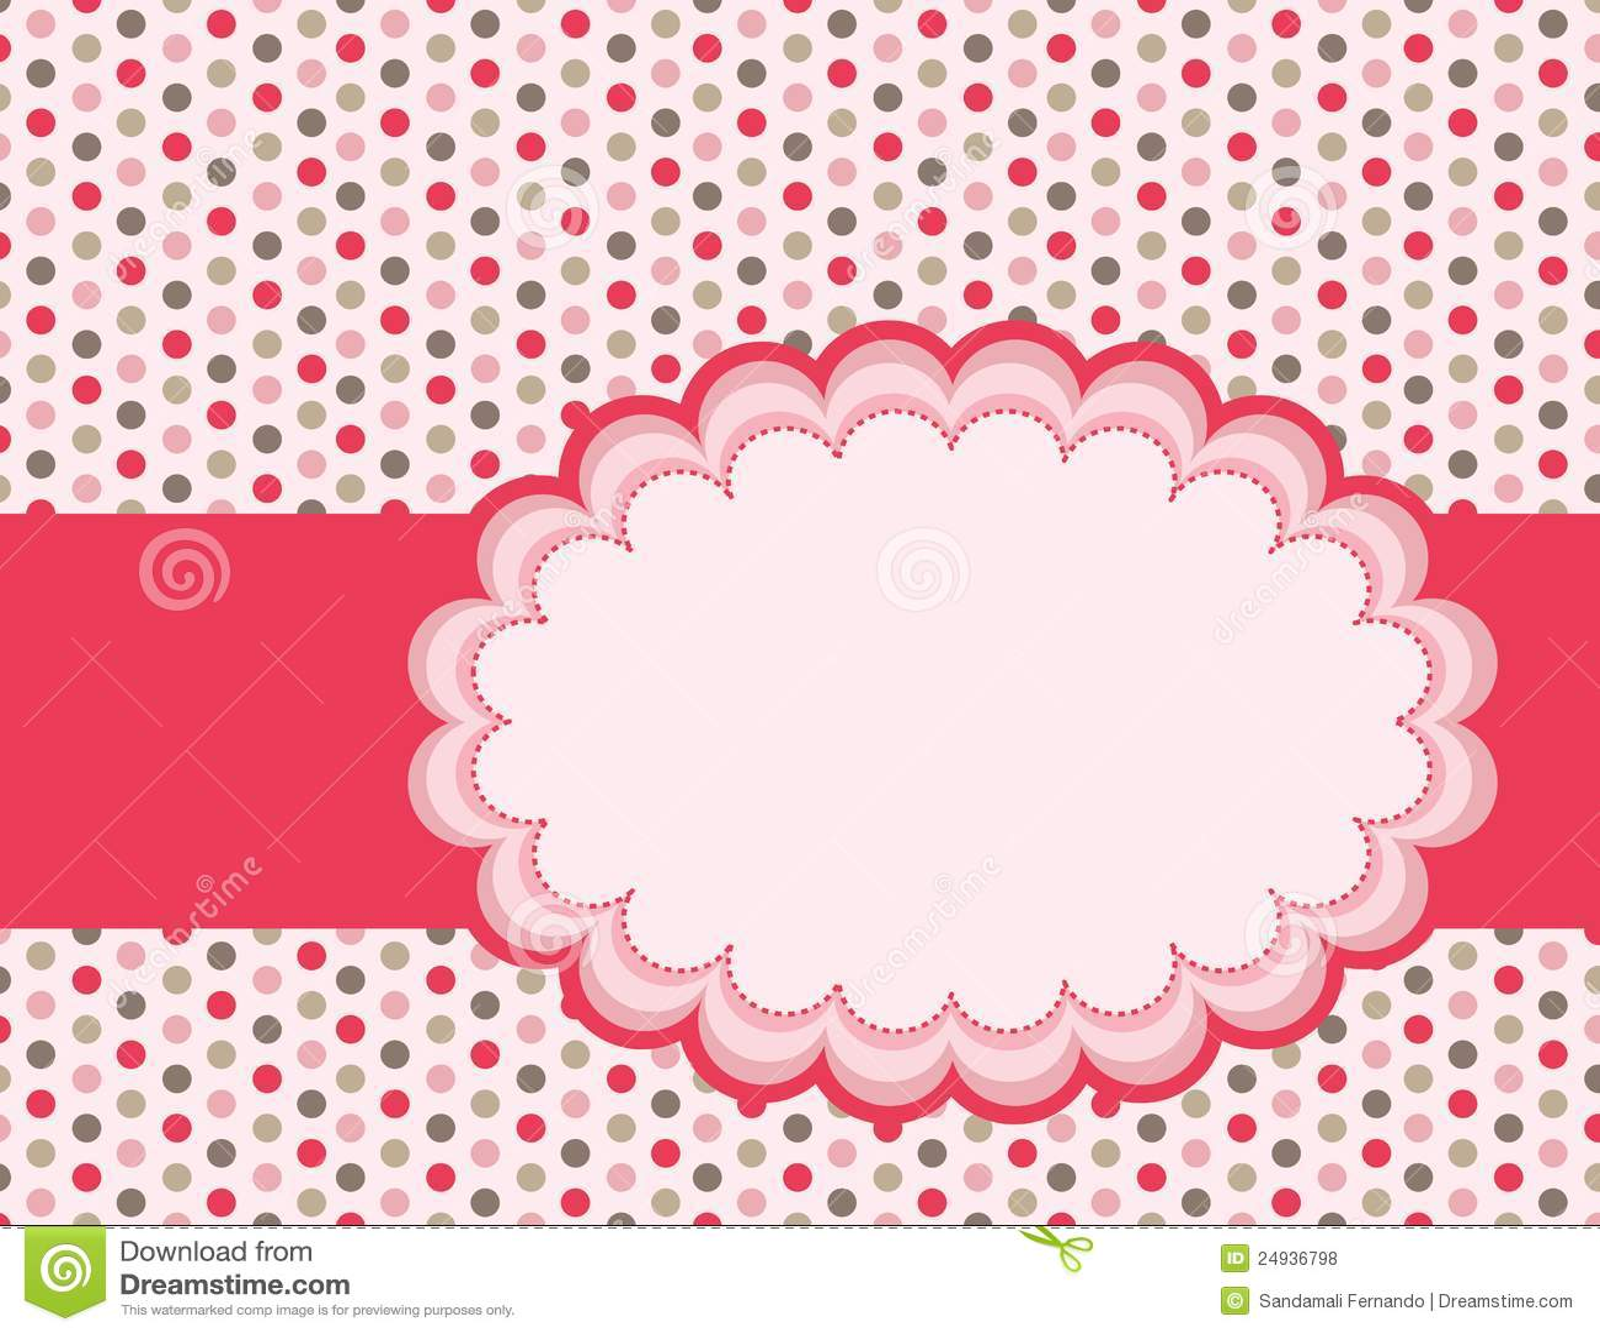 Cute Chevron Print Wallpaper Polka Background Stock Vector Illustration Of Dots